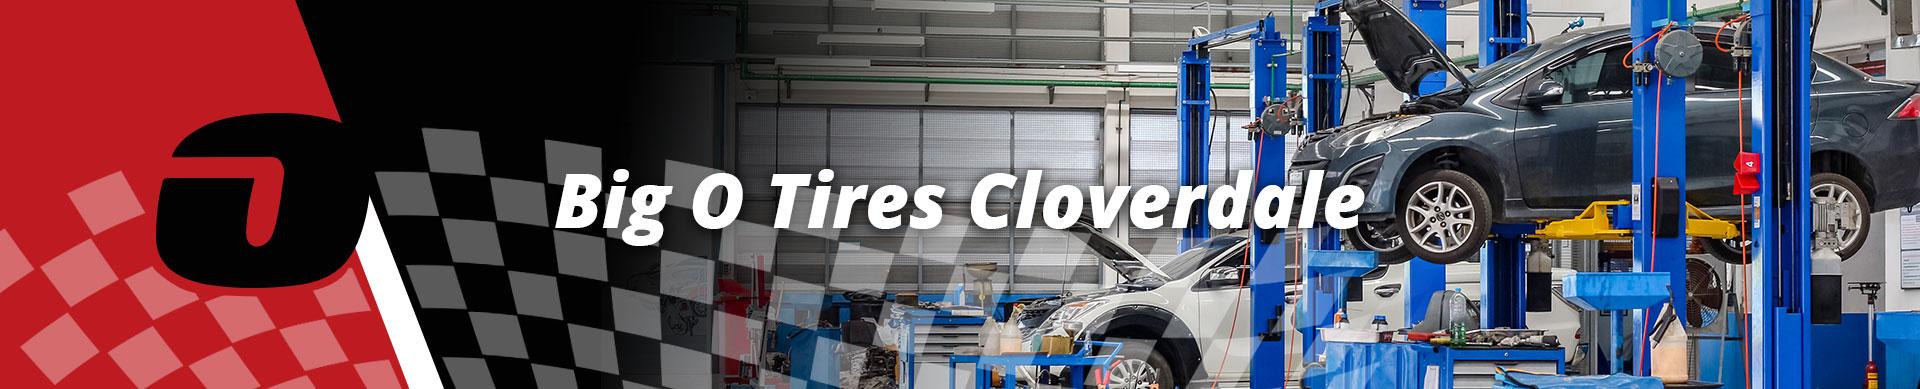 big-o-tire-cloverdale-auto-repair-shop